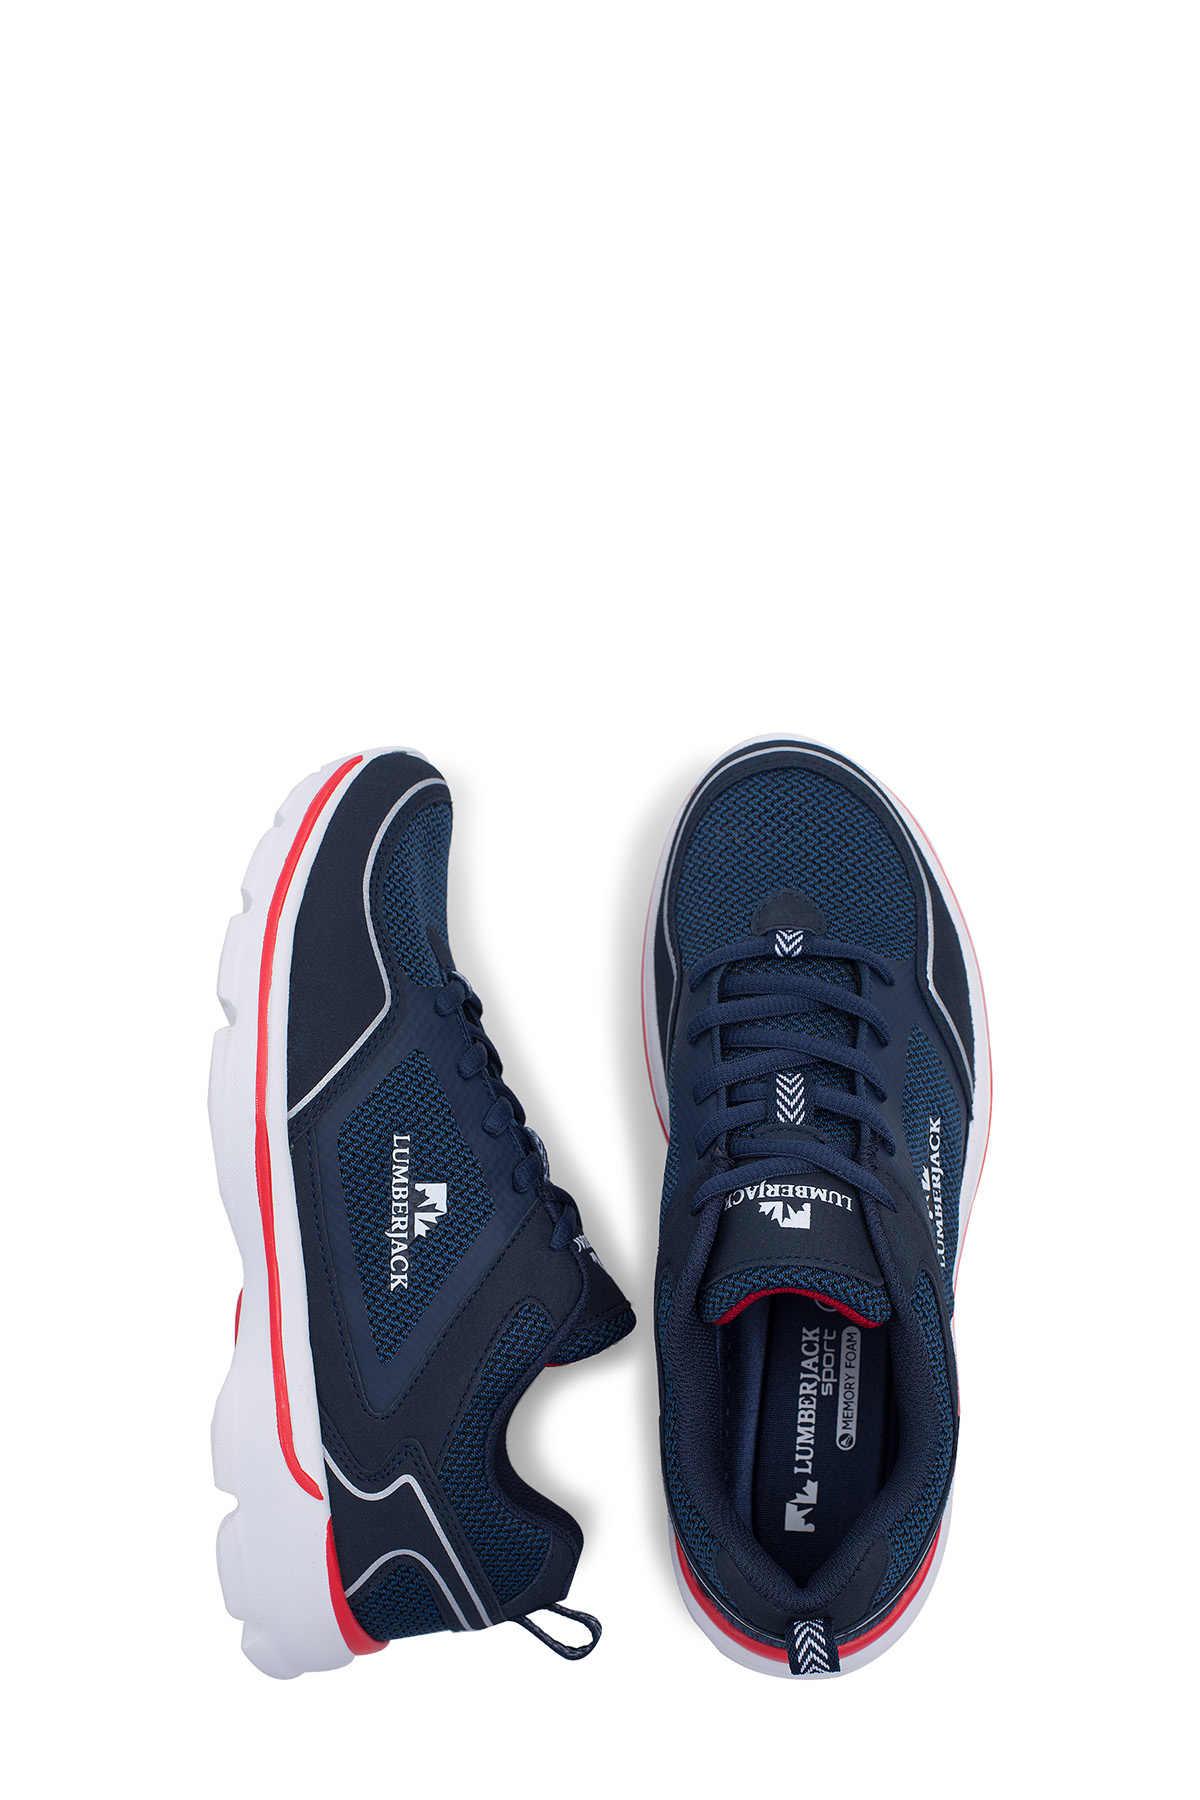 Lumberjack Shoes MALE SHOES SAILOR|Men